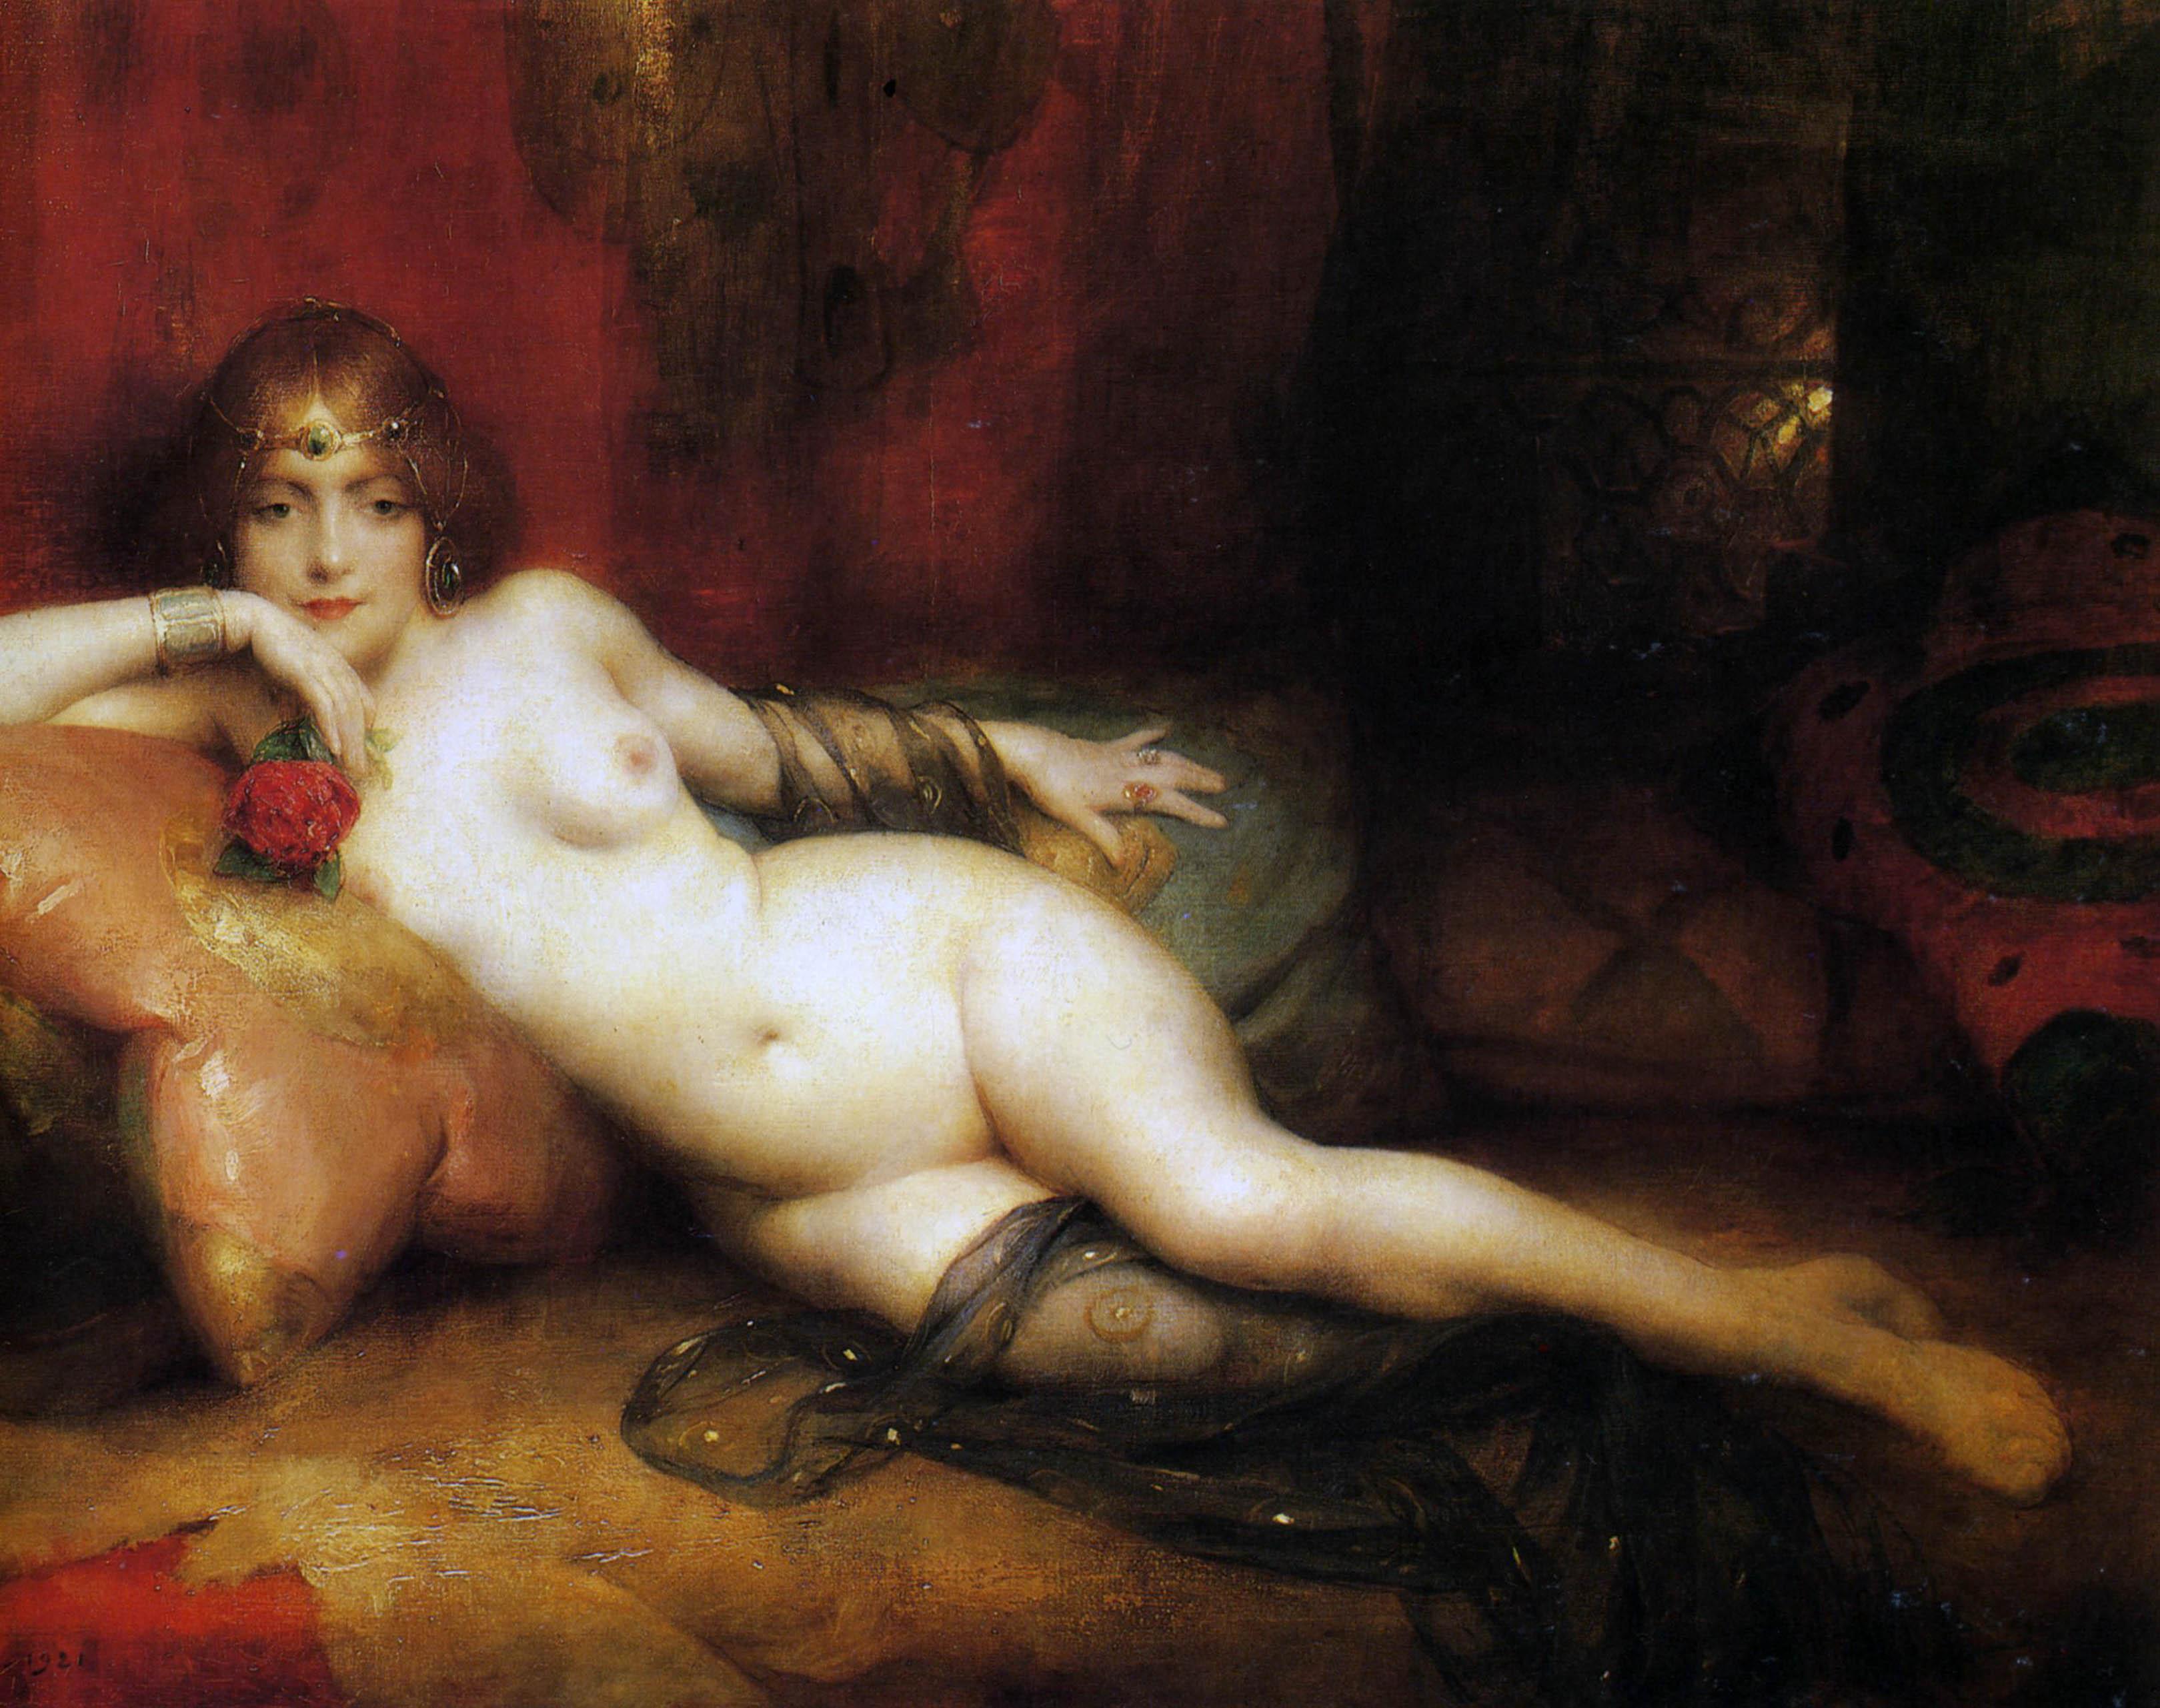 Adrien Henri Tanoux, 1865-1923. Саламбо. 1921. 74 х 100 см. Частная коллекция